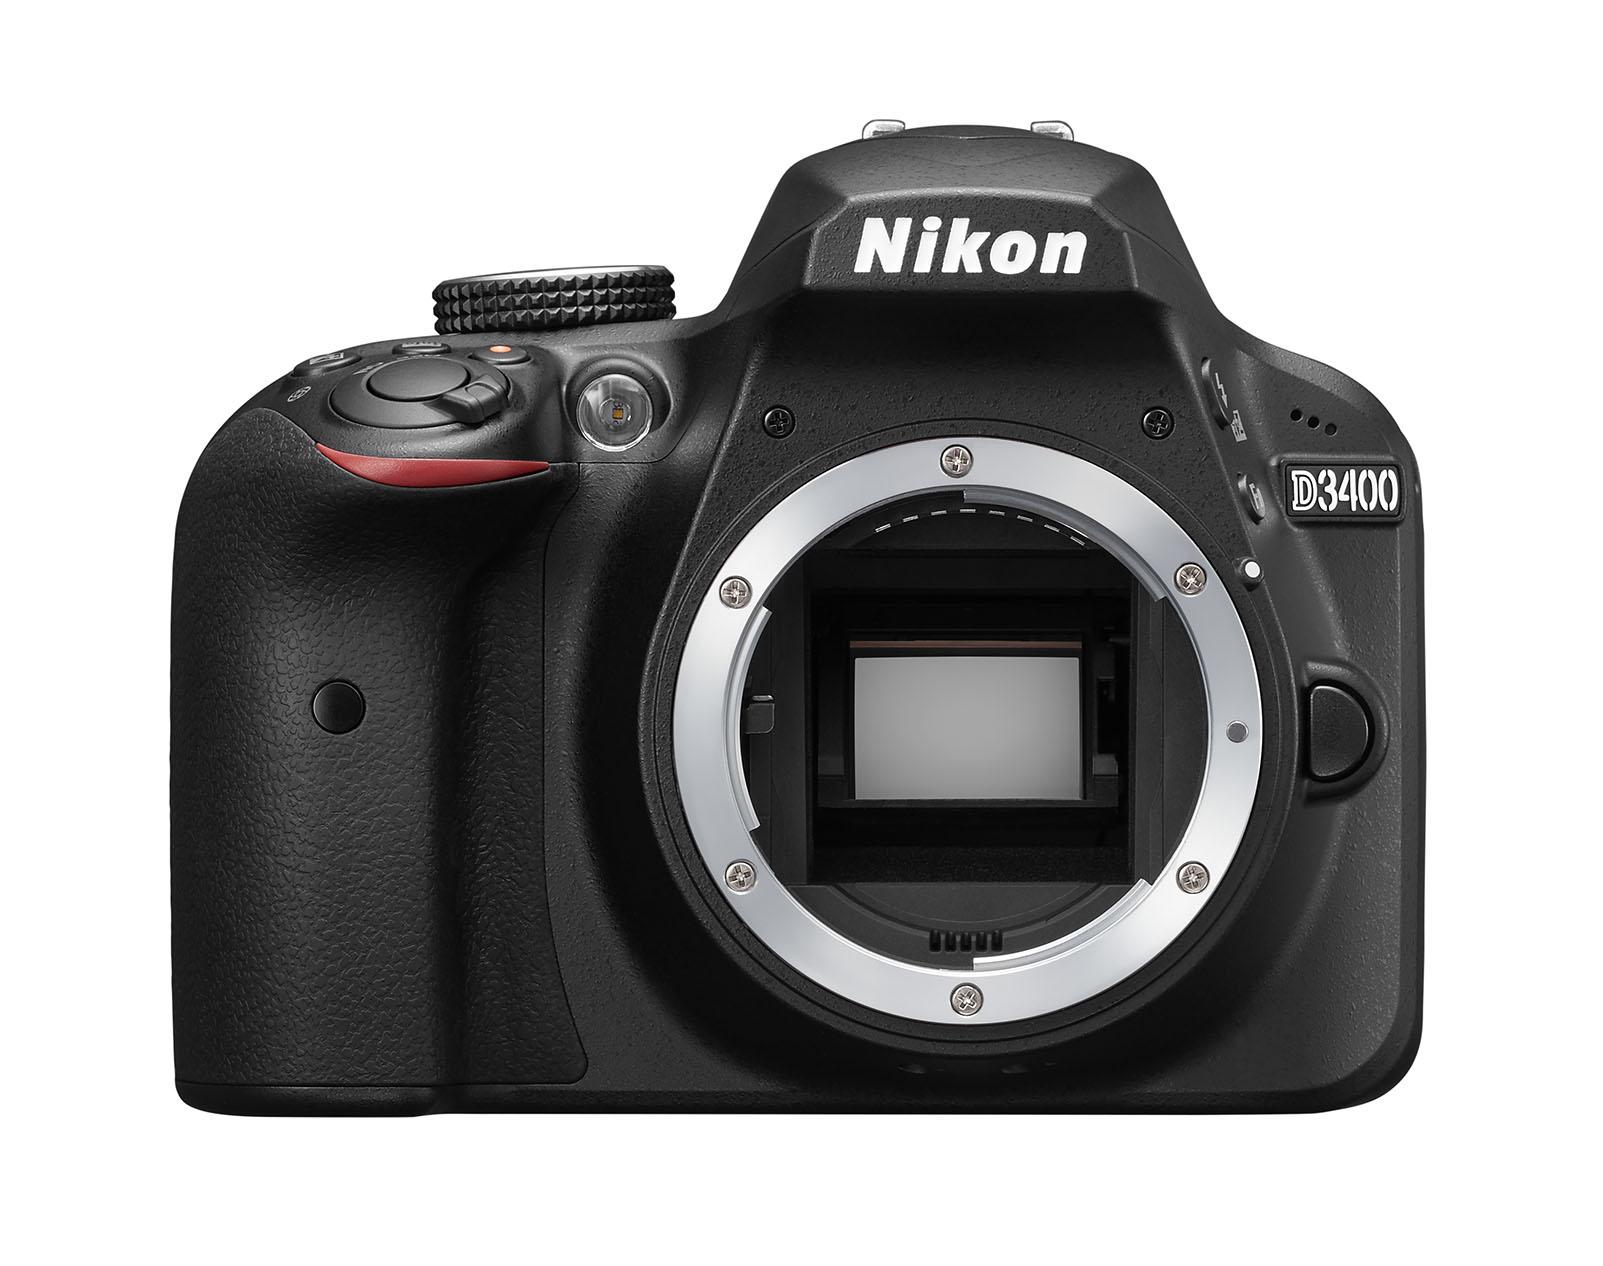 f22-cz-Nikon-D3400_BK_front